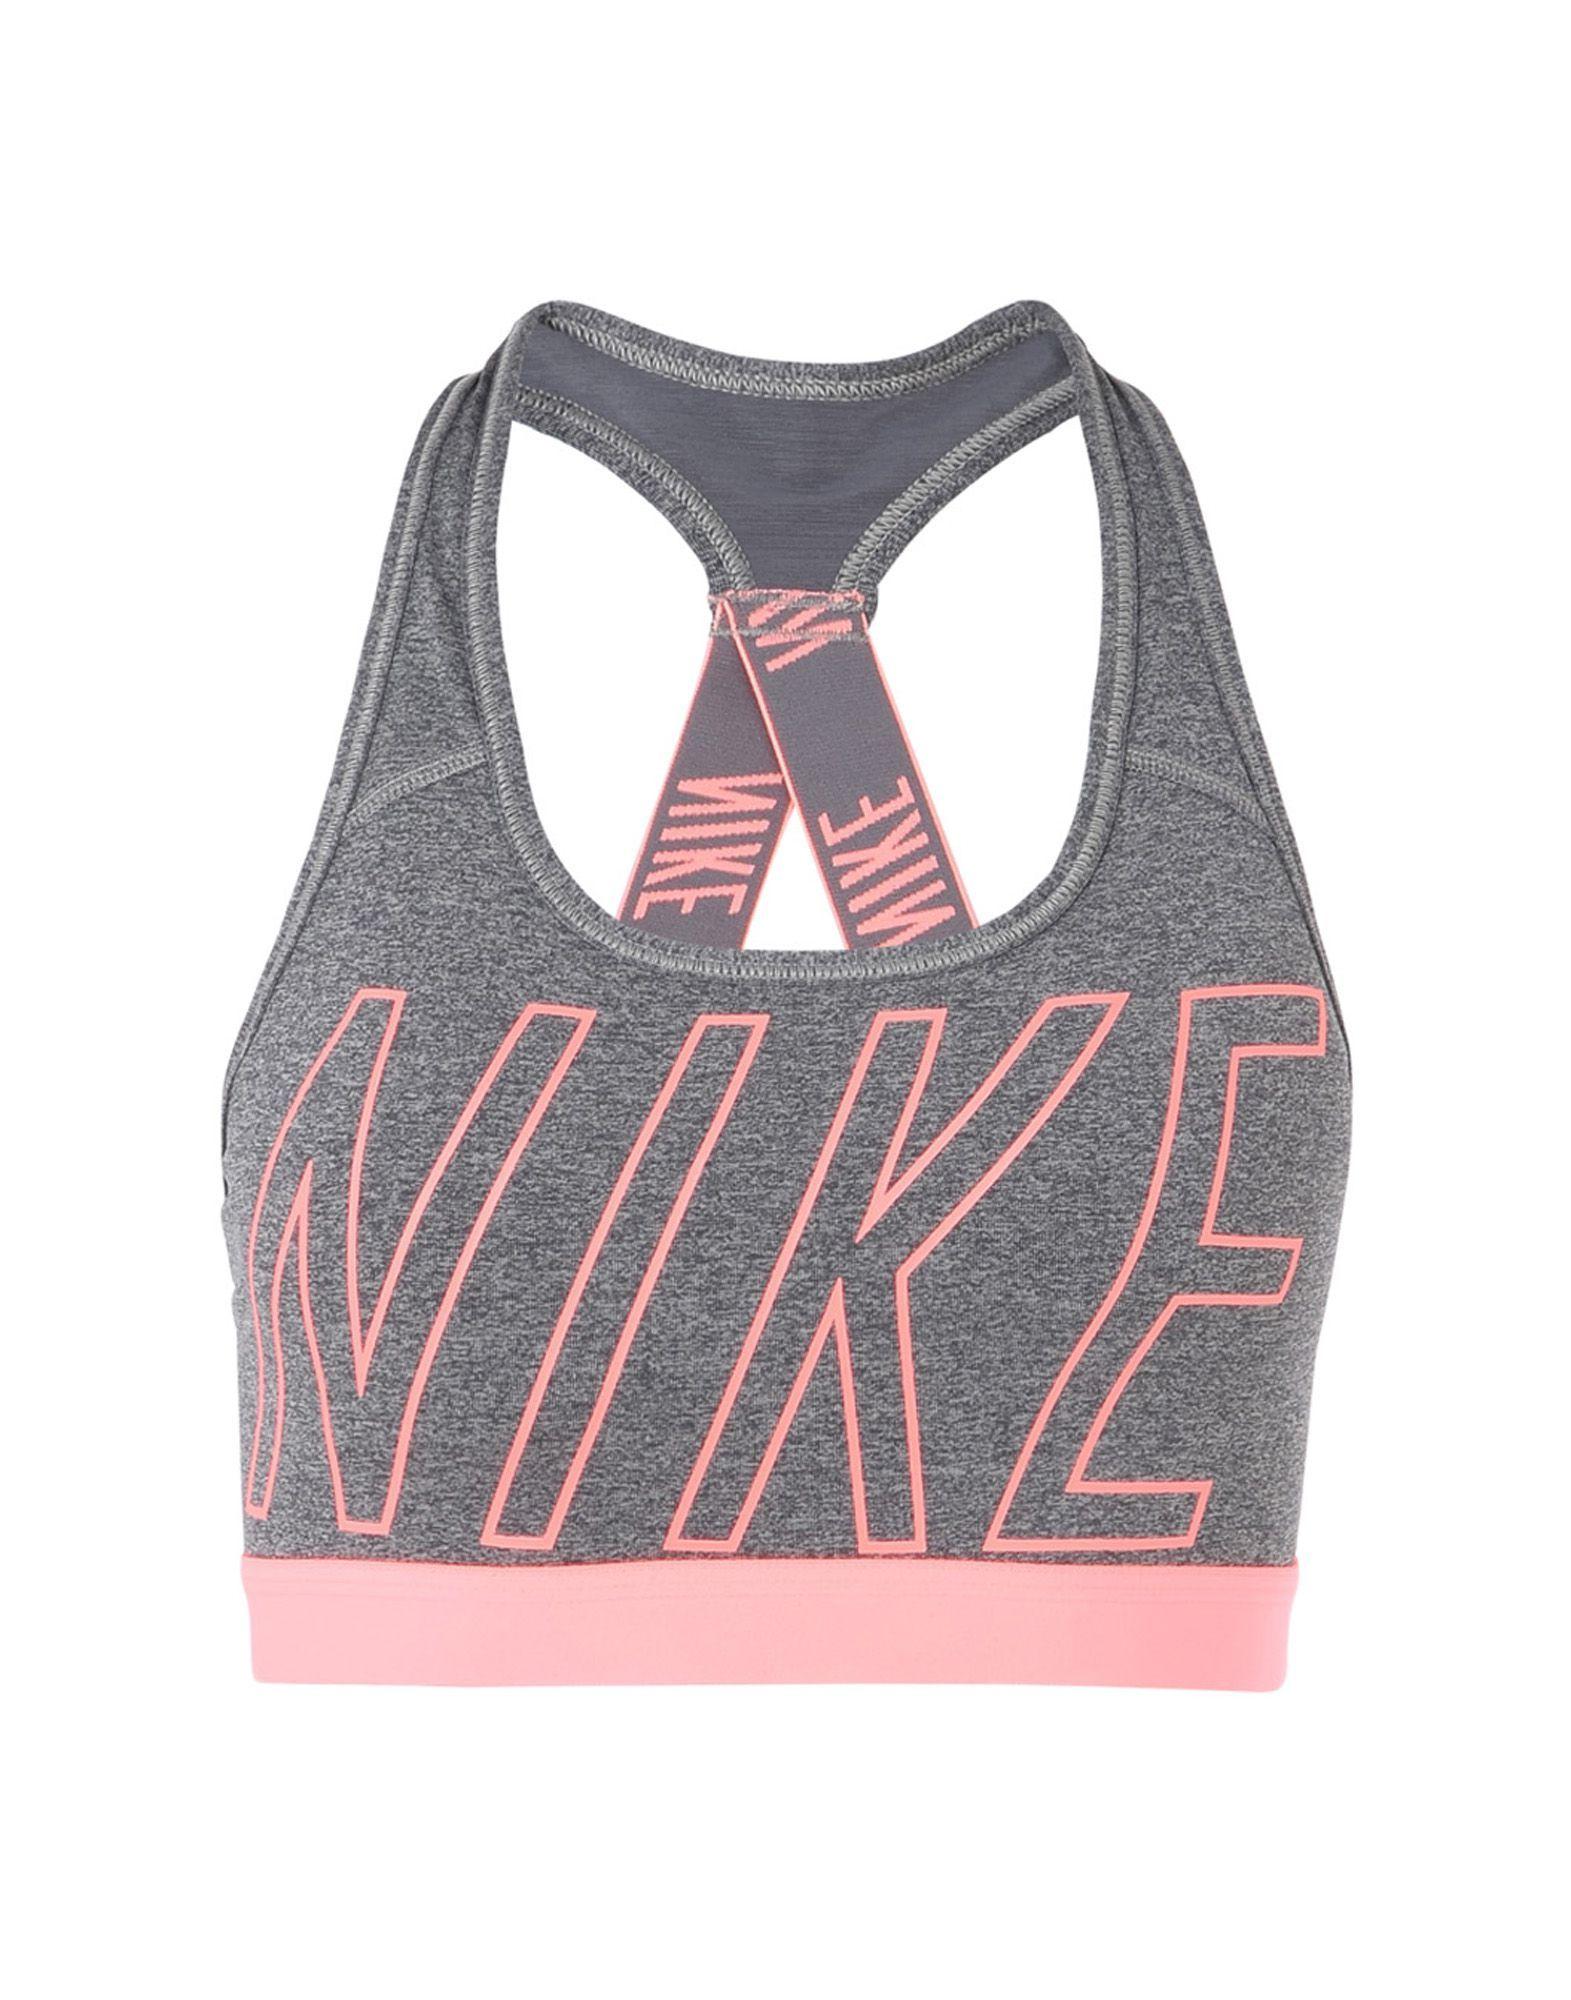 Nike Grey Polyester Top